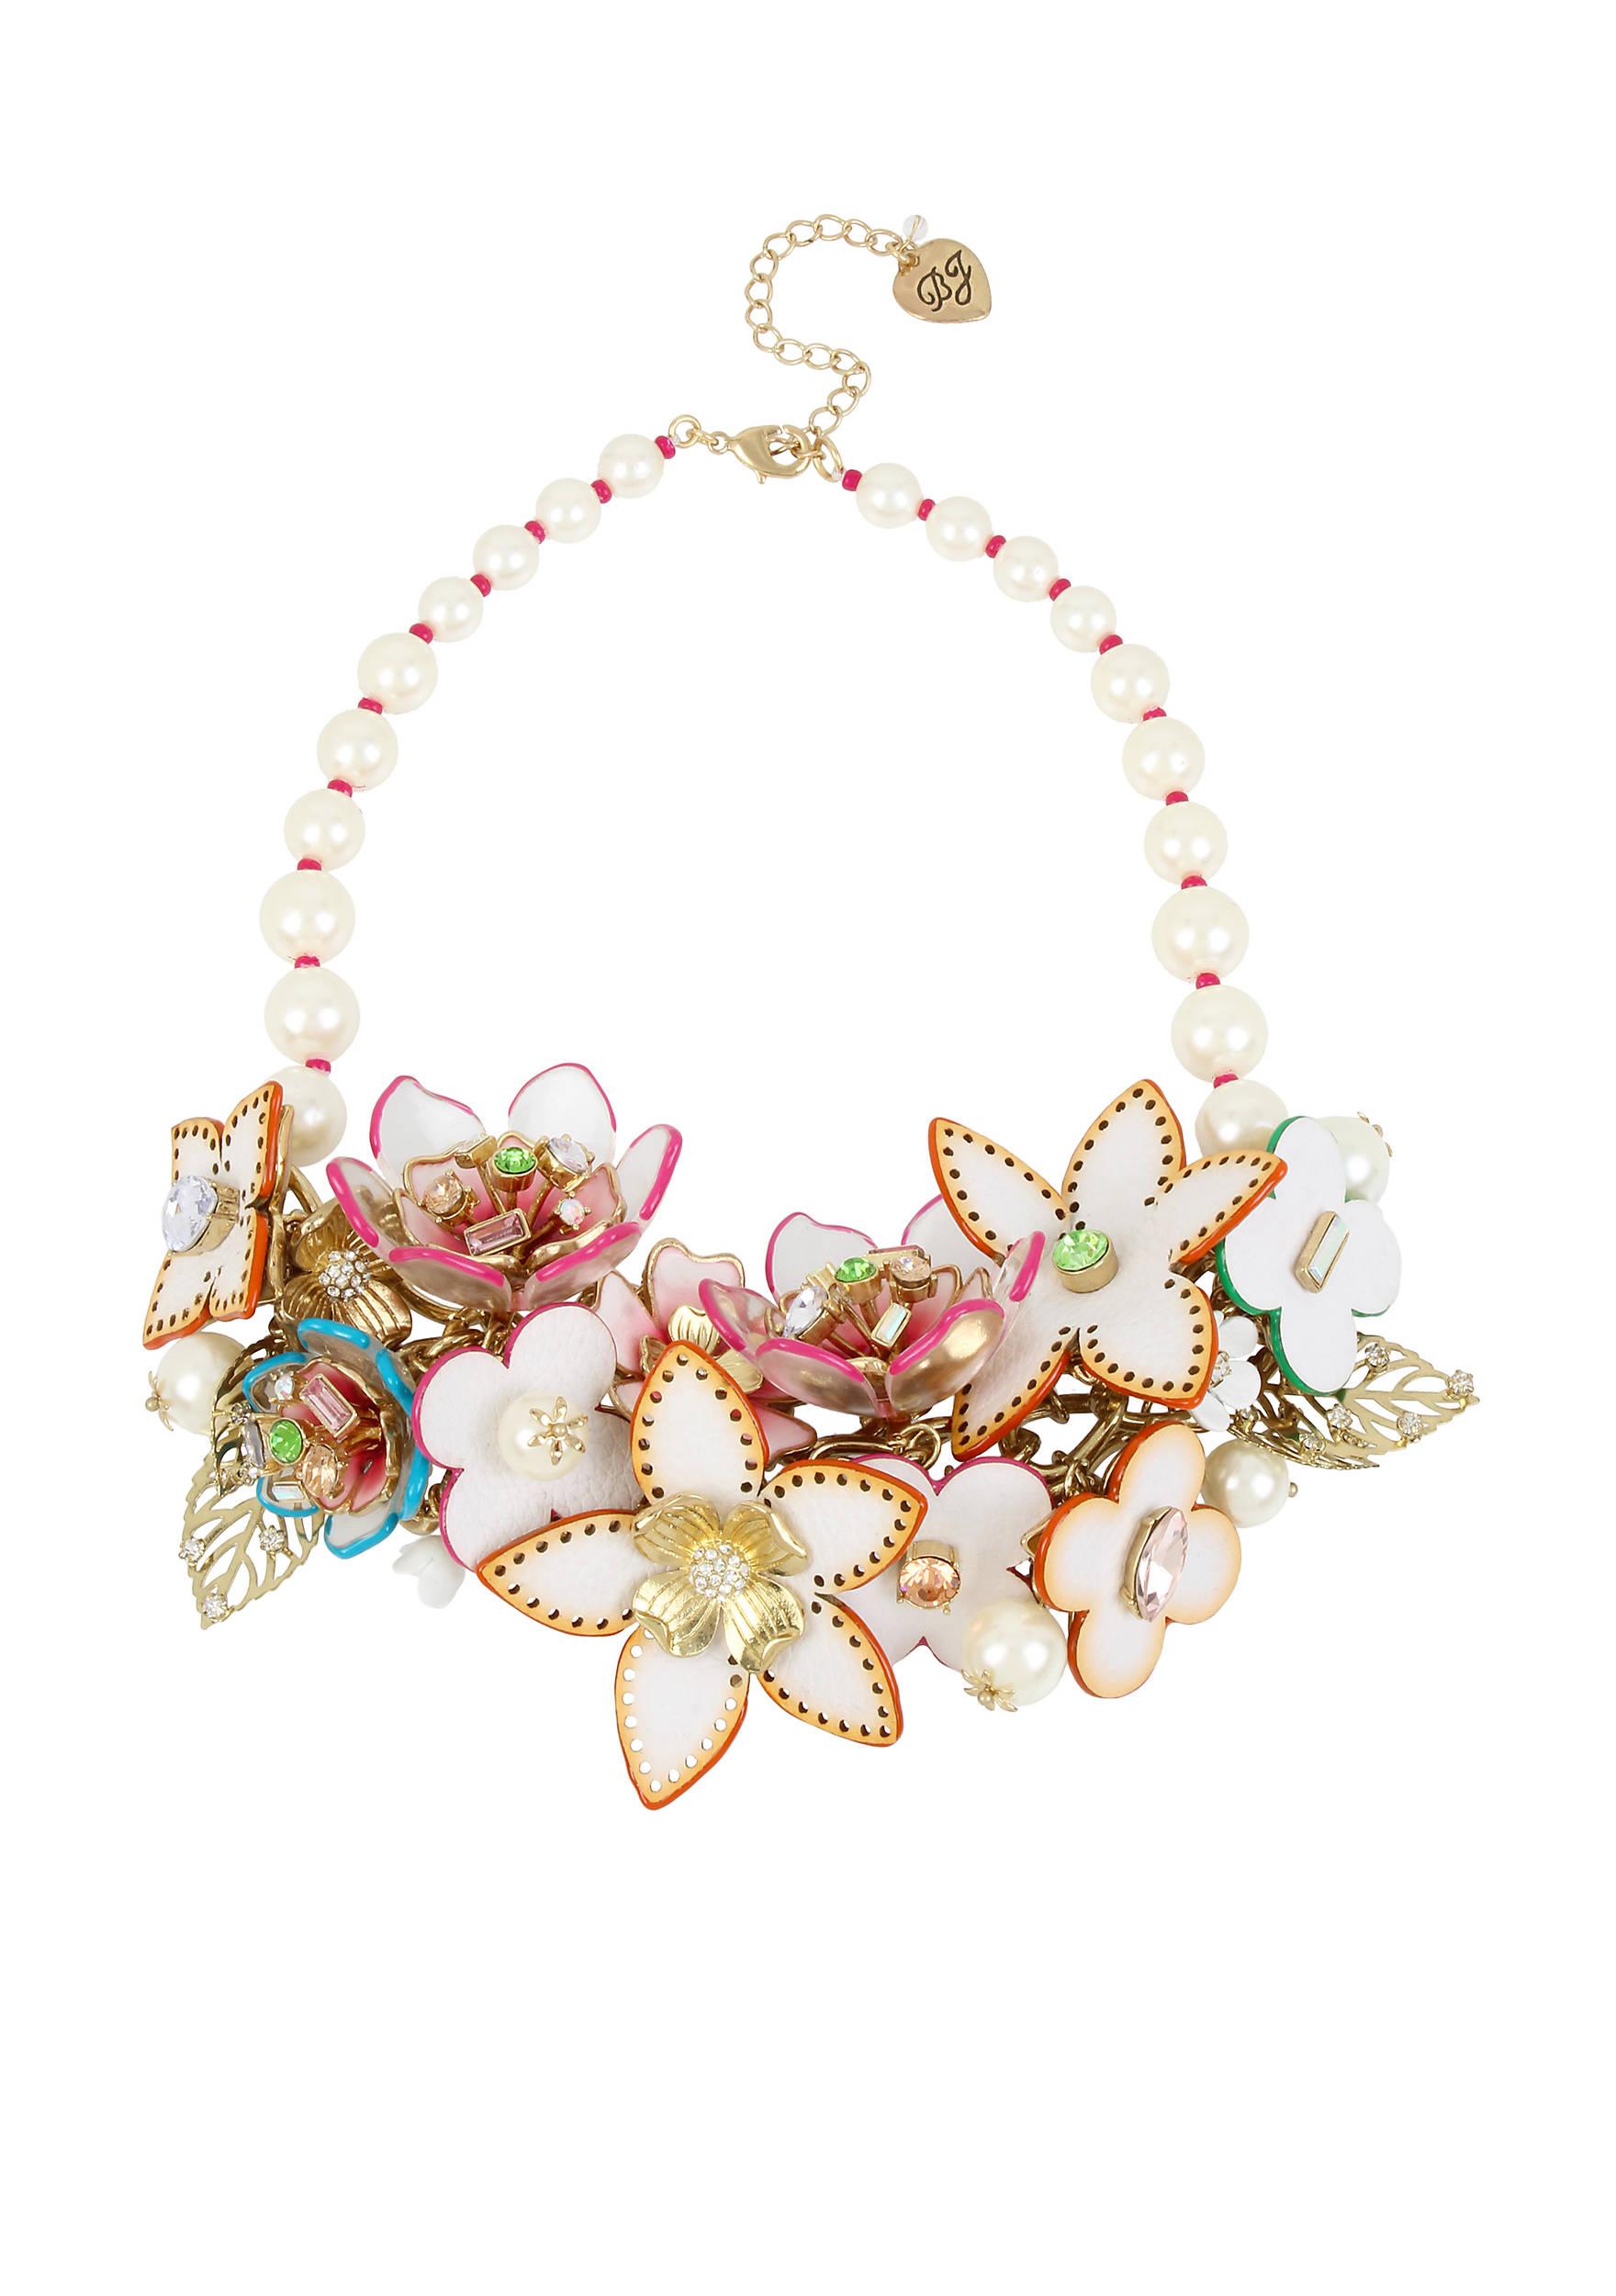 Betsey Johnson Gold-Tone Leather Flower Statement Bib Necklace | belk